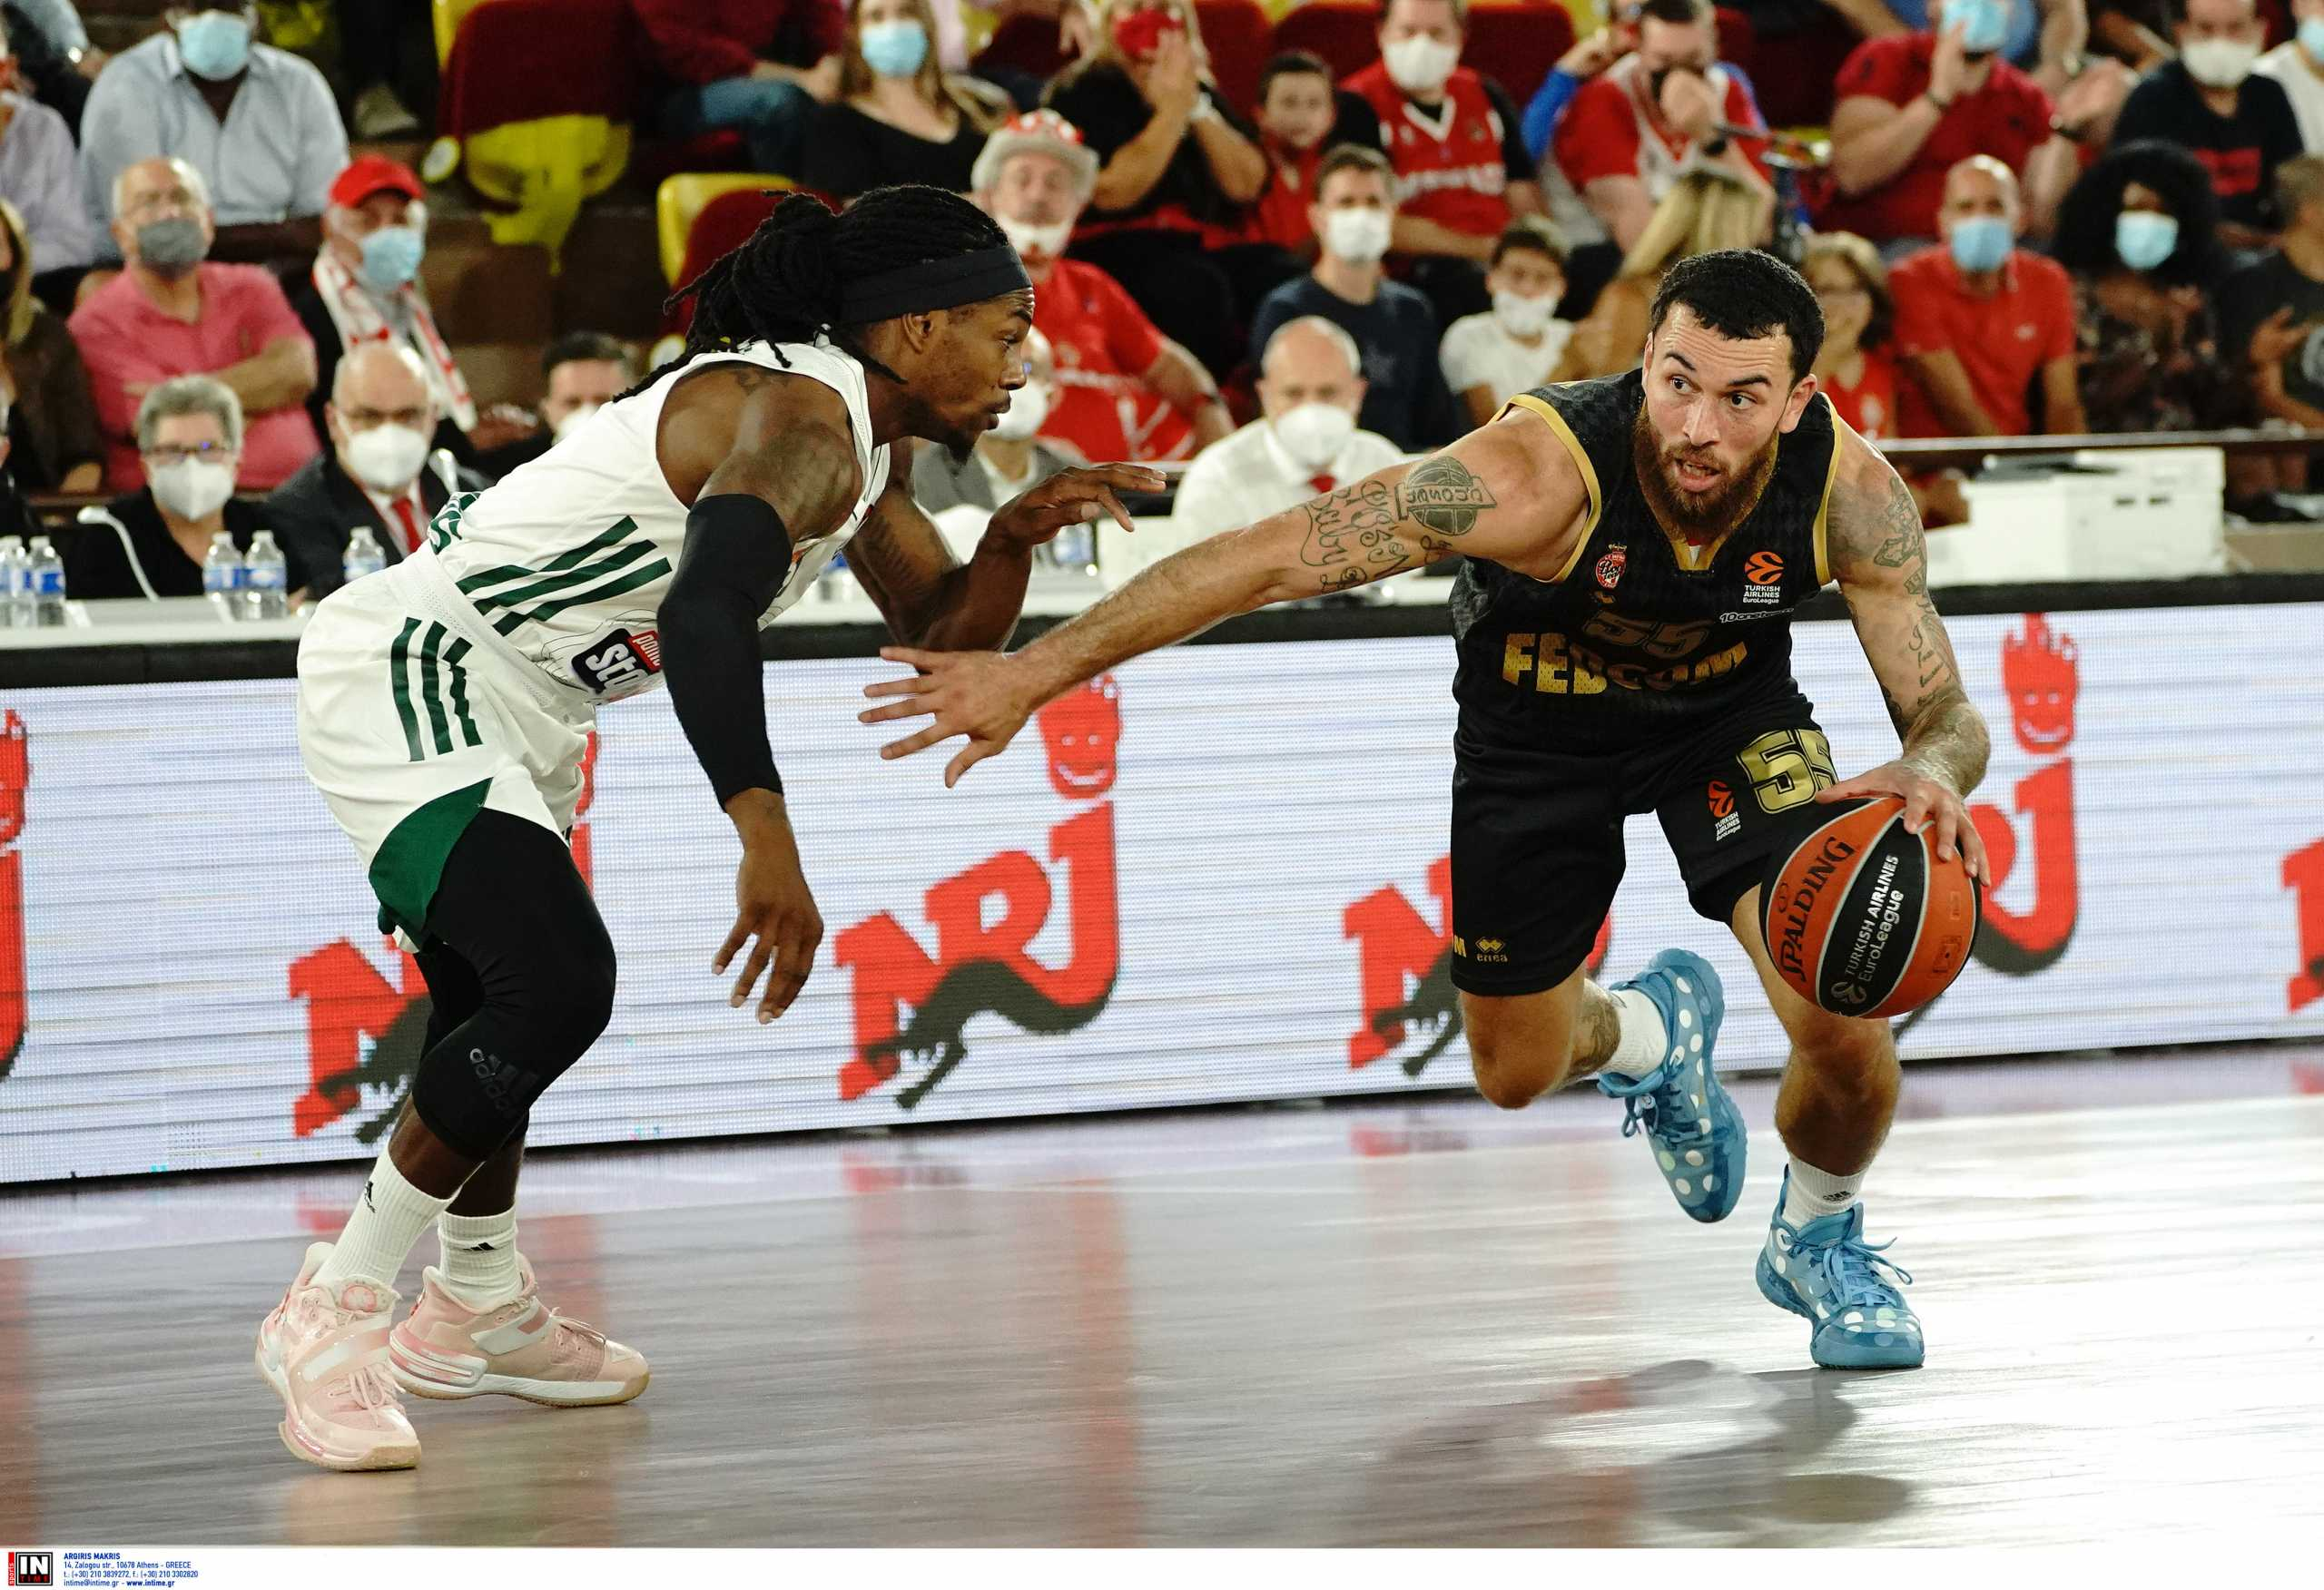 Euroleague, Μονακό – Παναθηναϊκός 75-63: «Ξυπόλυτοι» στο Πριγκιπάτο οι «πράσινοι»